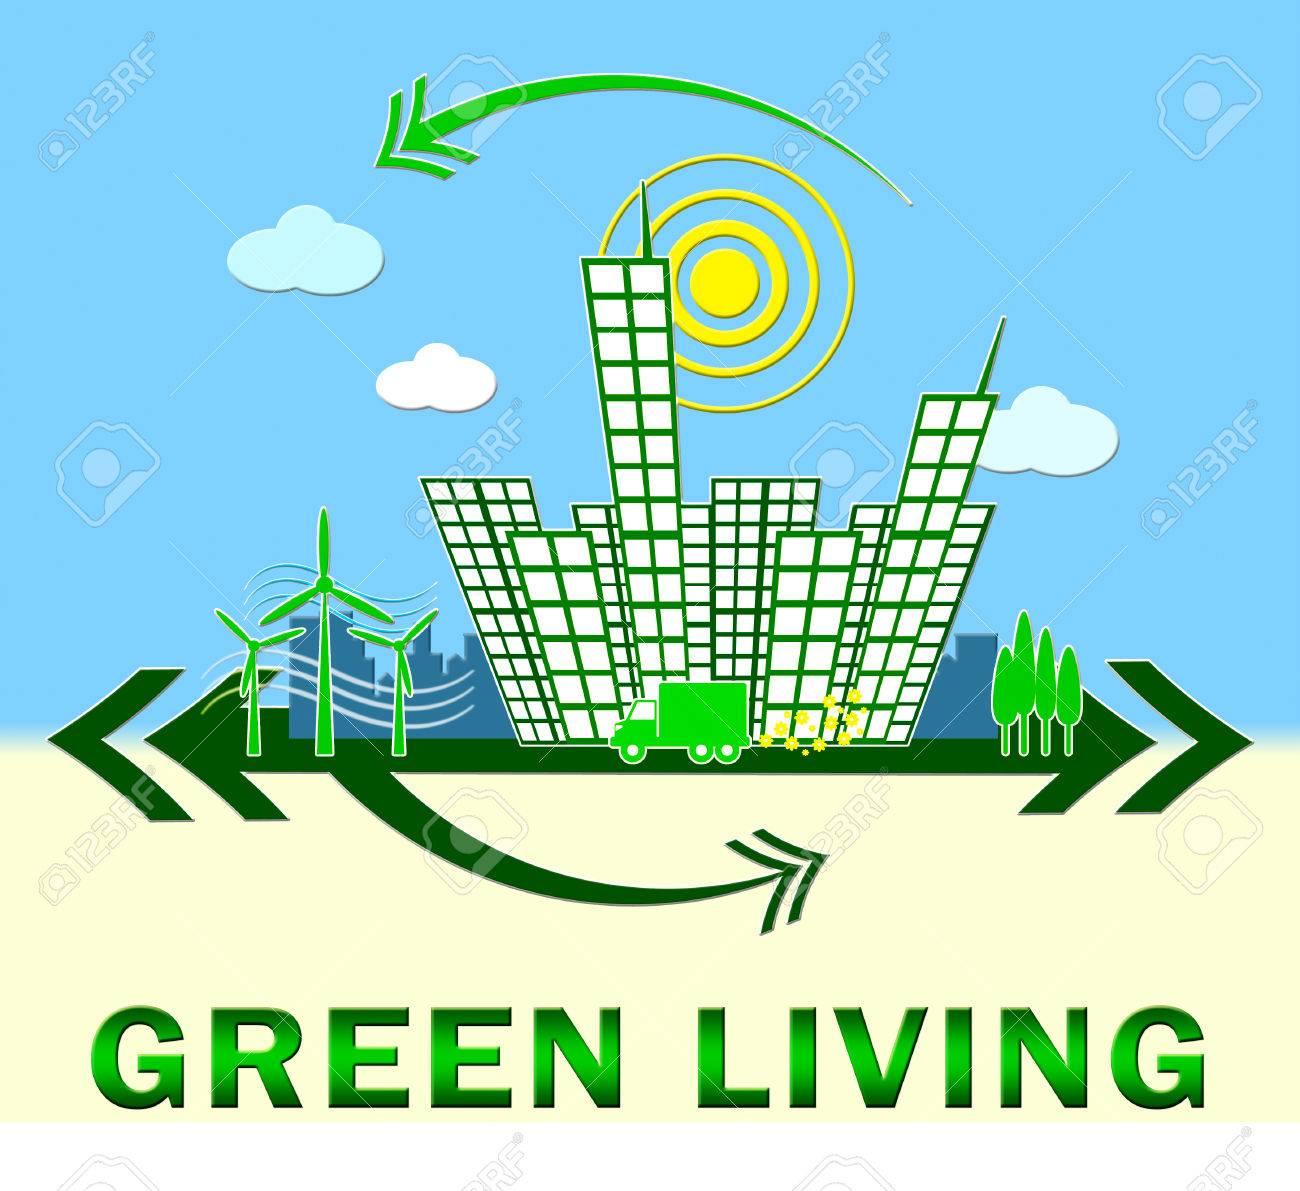 Grün Leben Stadt Bedeutung öko Leben 3d Illustration Lizenzfreie